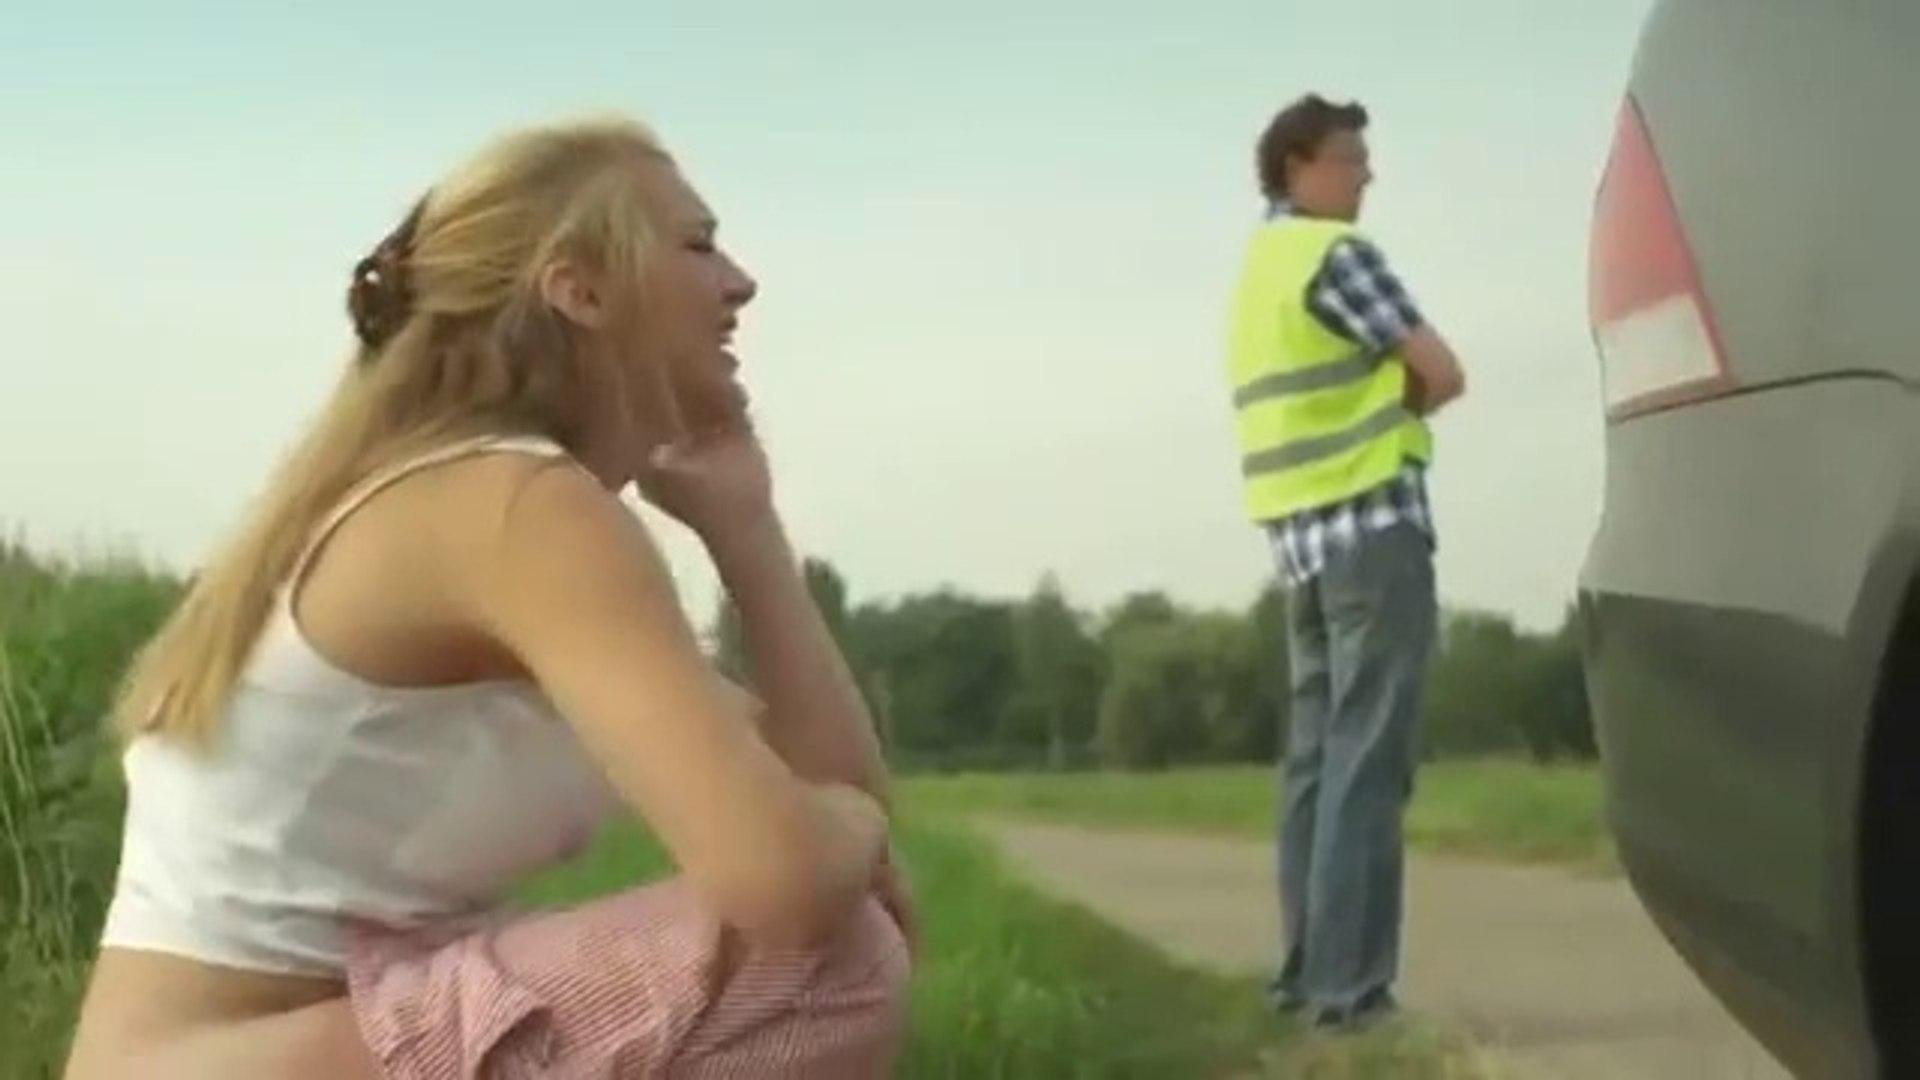 Women pulling their pants down